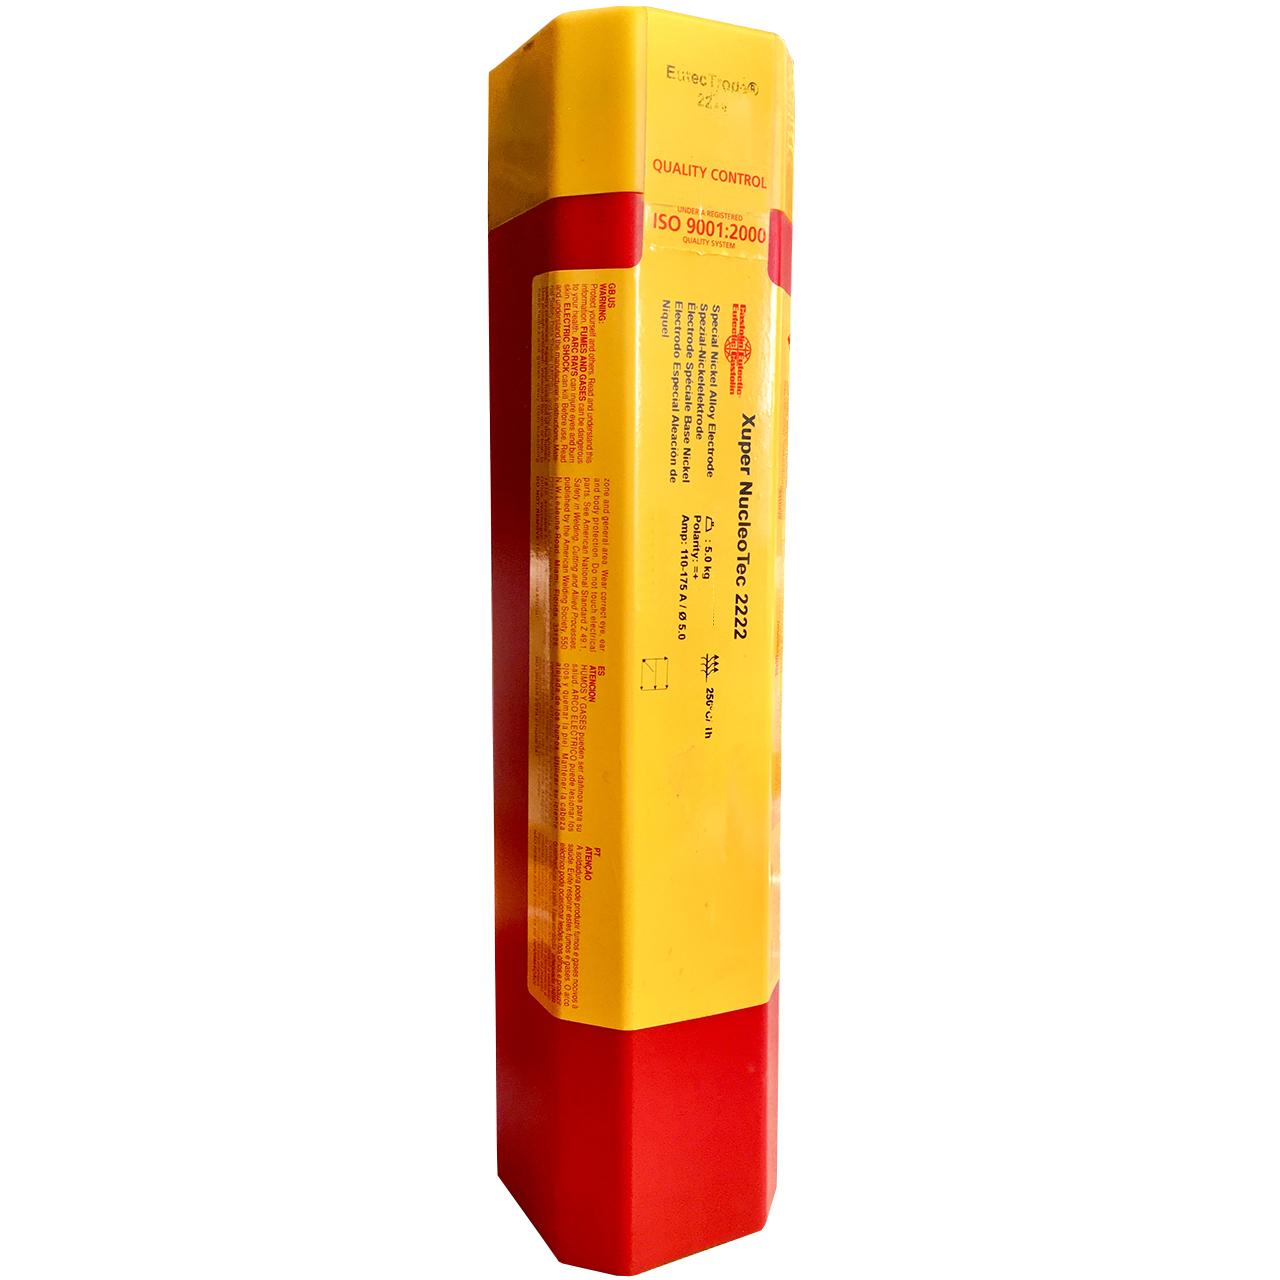 الکترود جوشکاری کاستولین یوتکتیک کد X 2222 وزن 5 کیلوگرم